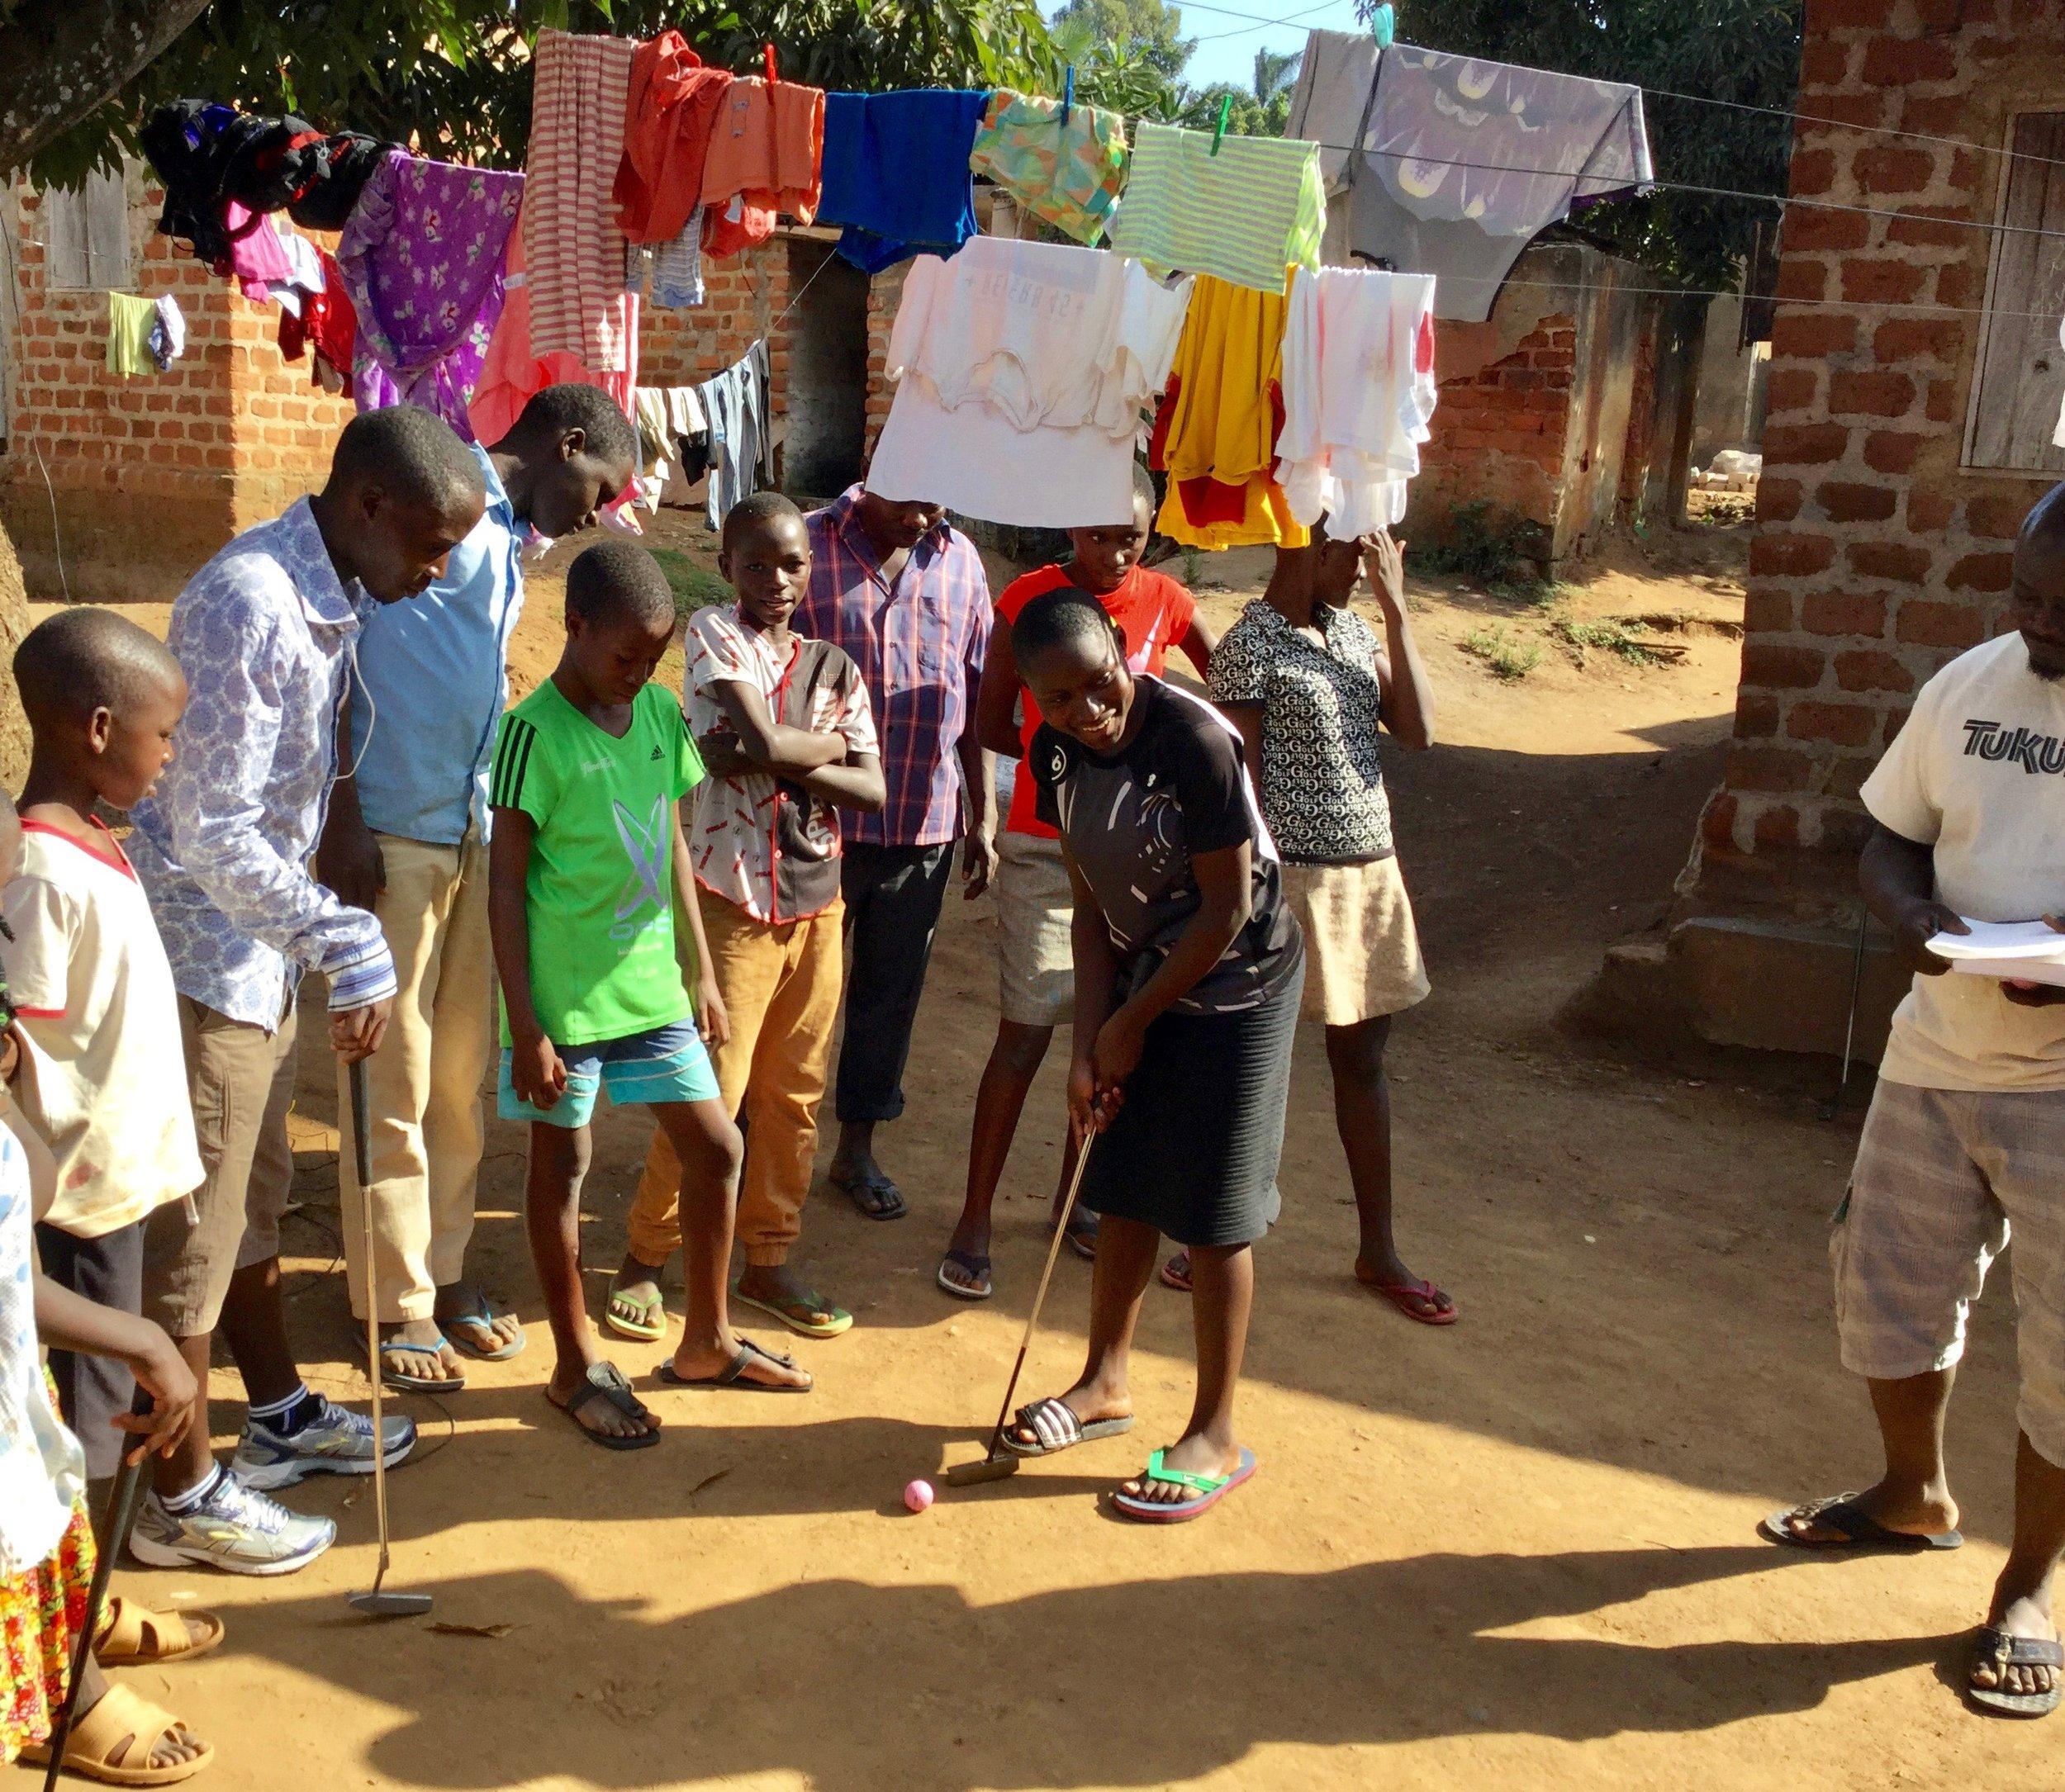 Putting practice at the Tukutana Community Center in Munyonyo, Uganda.